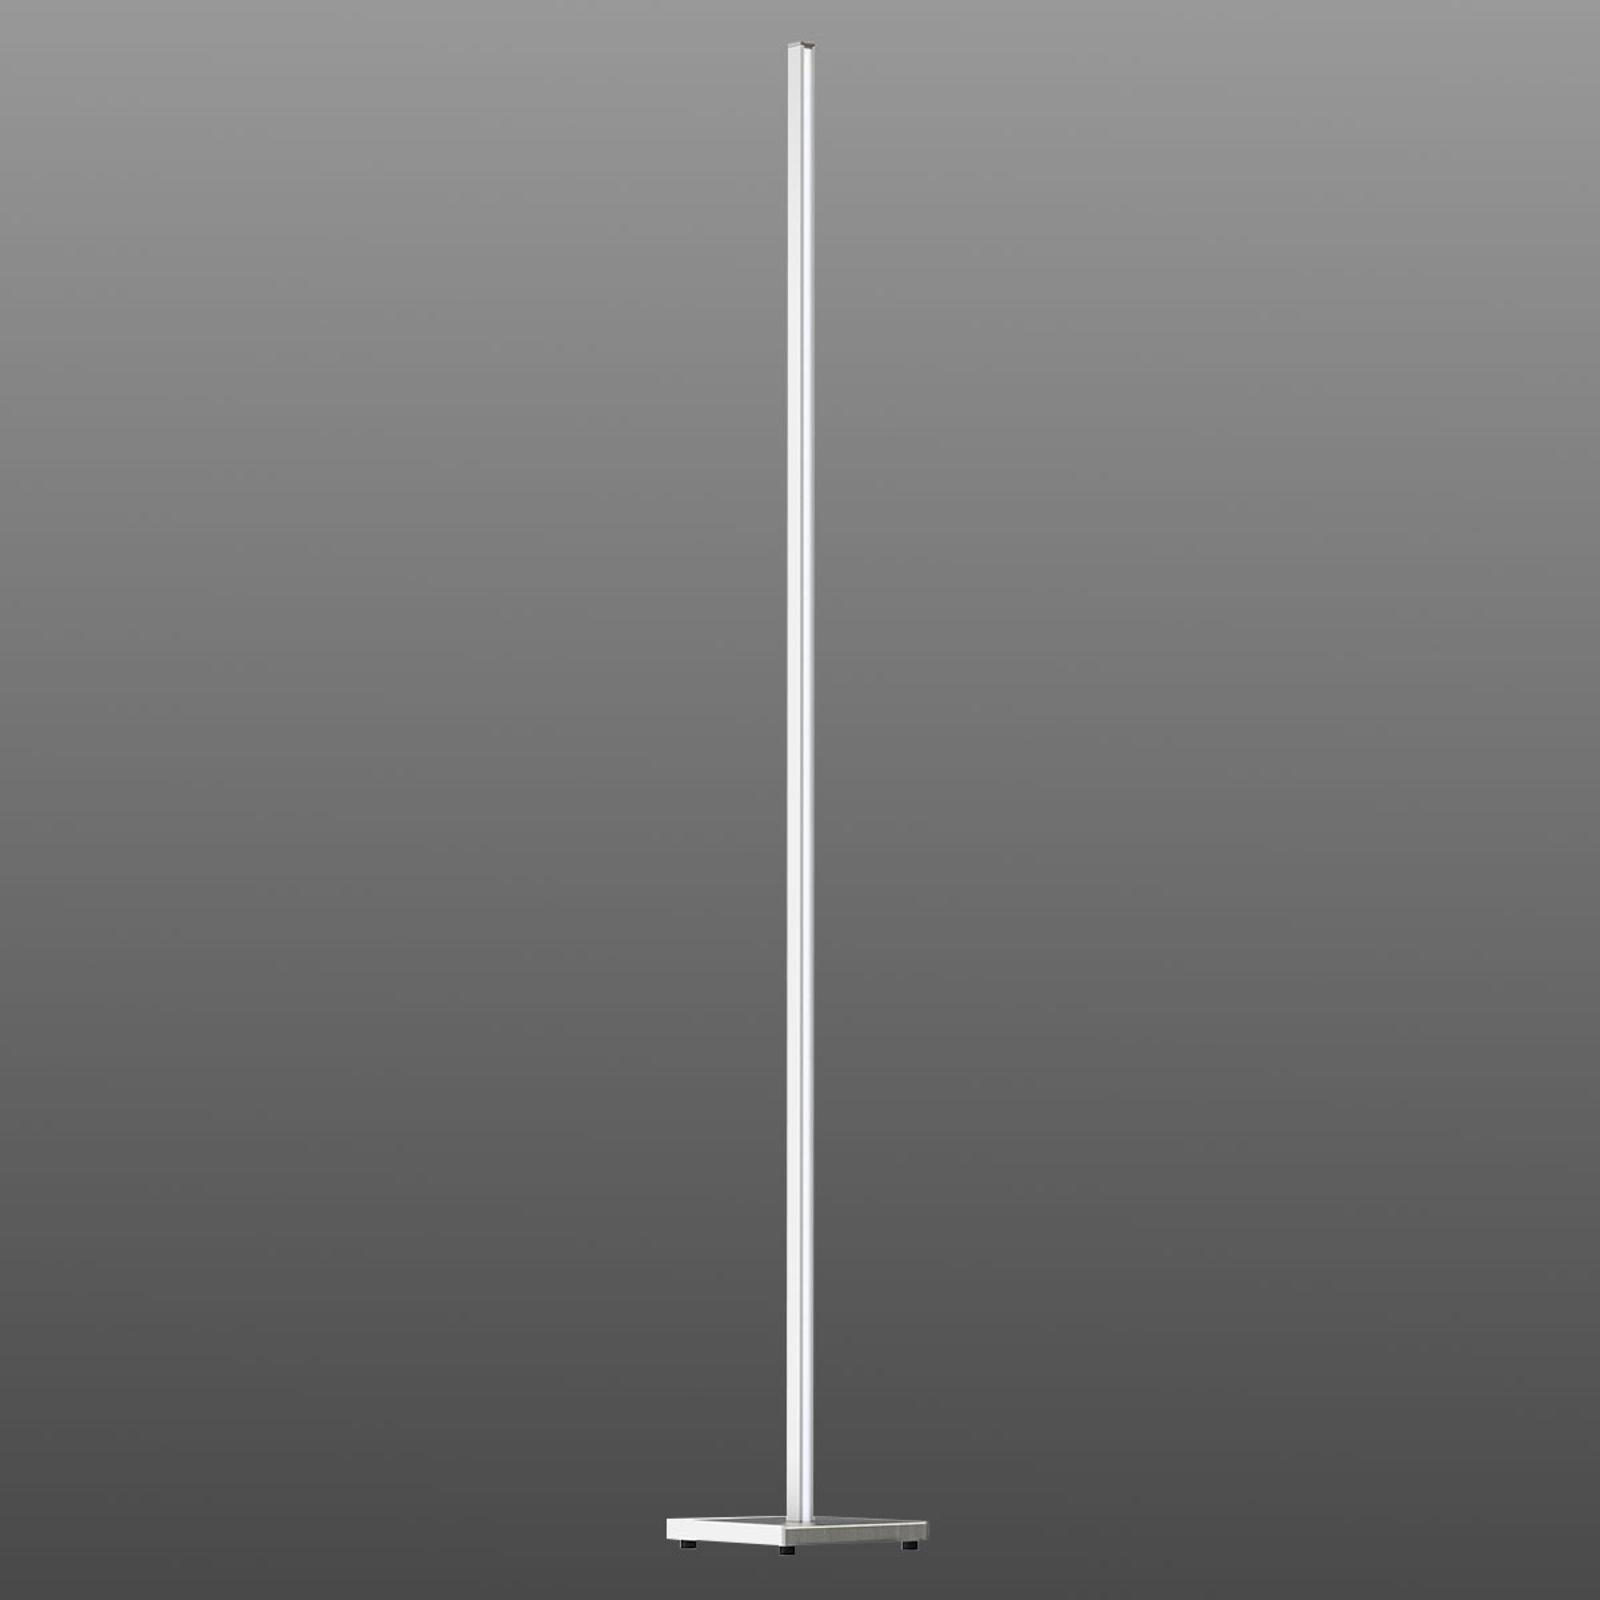 Funkcjonalna lampa stojąca LED Orix biała, 180 cm